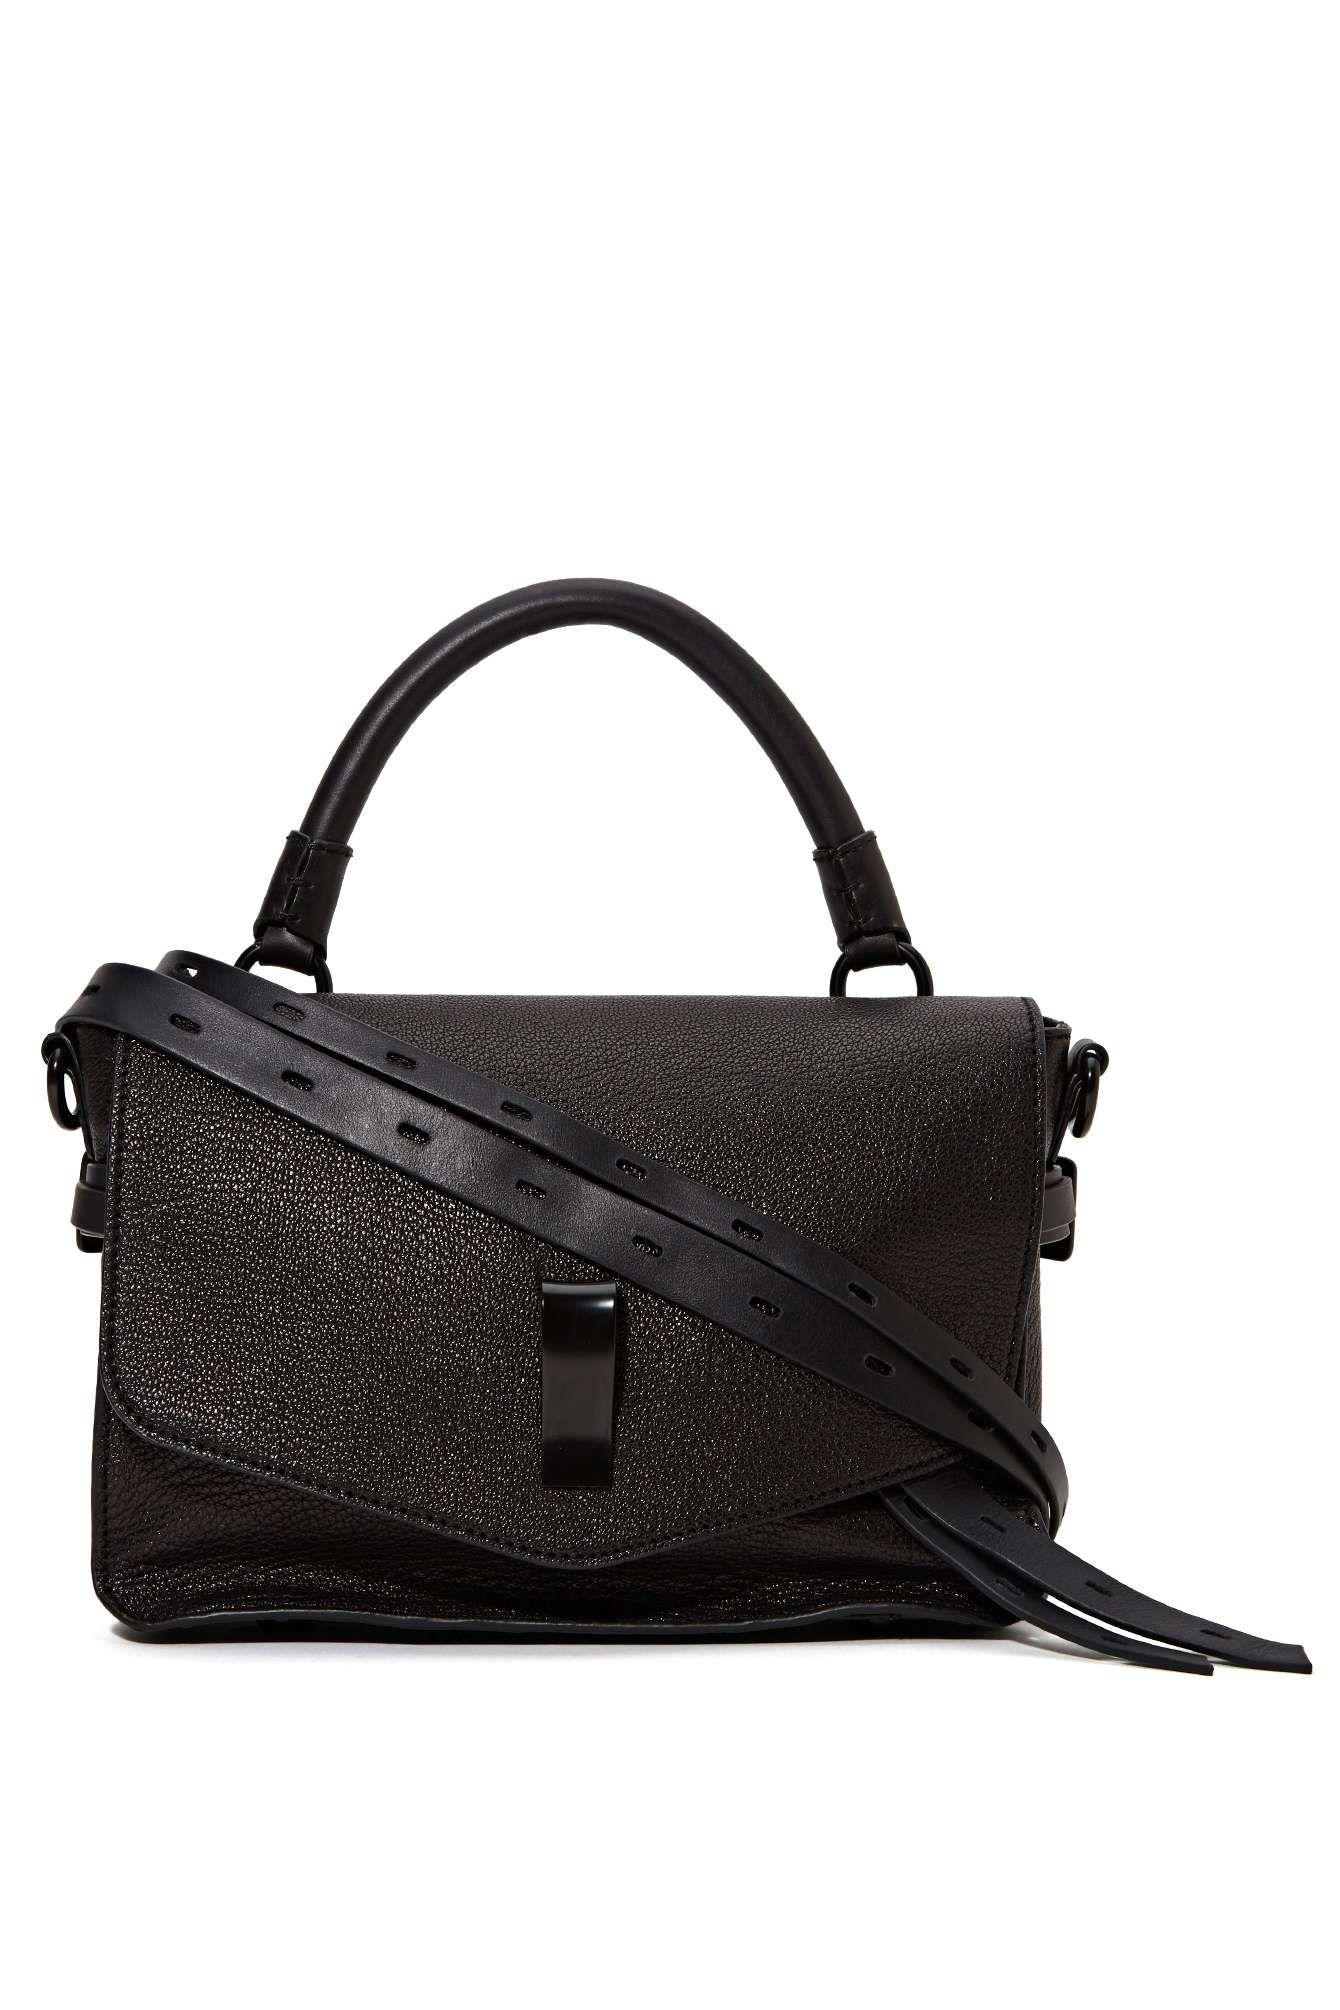 Joy Gryson Ellie Bag Bags Backpacks At Nasty Gal